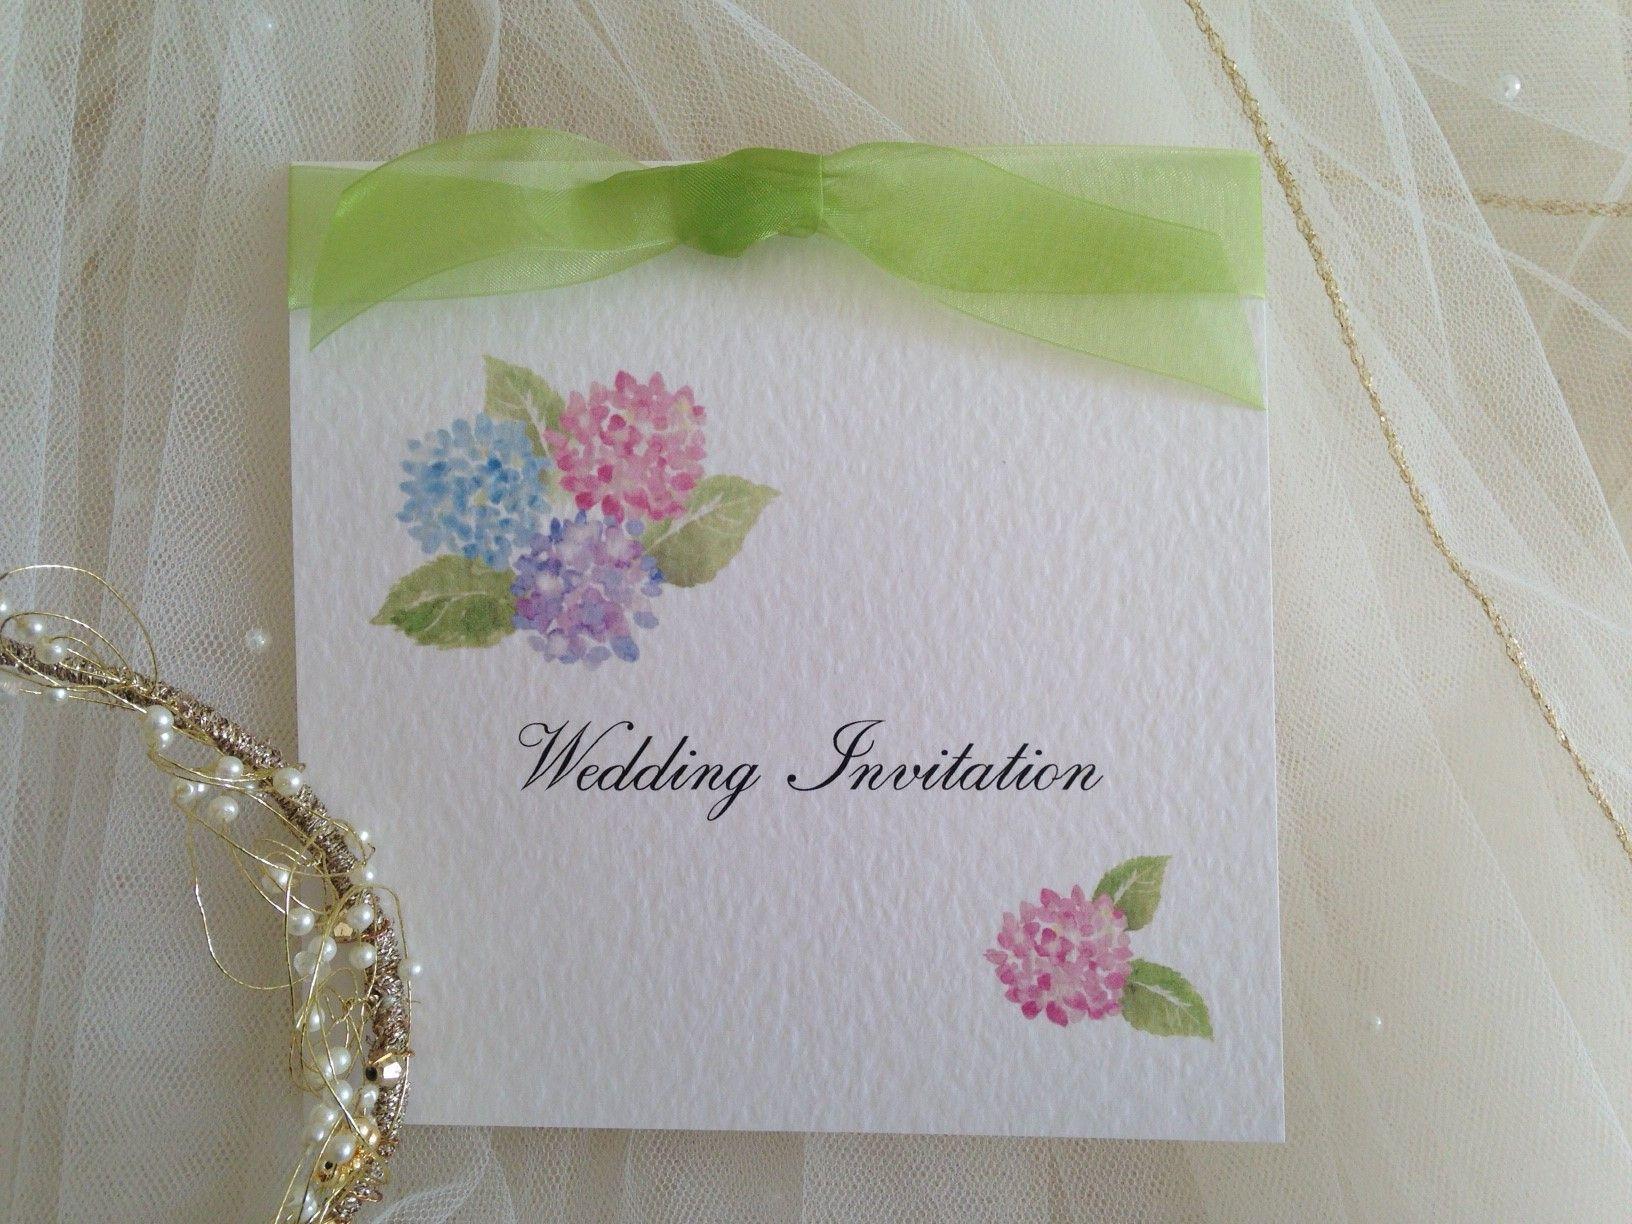 https://www.invitationhouse.co.uk/wedding-invitations Hydrangea Wedding Invitations from £1.25 each